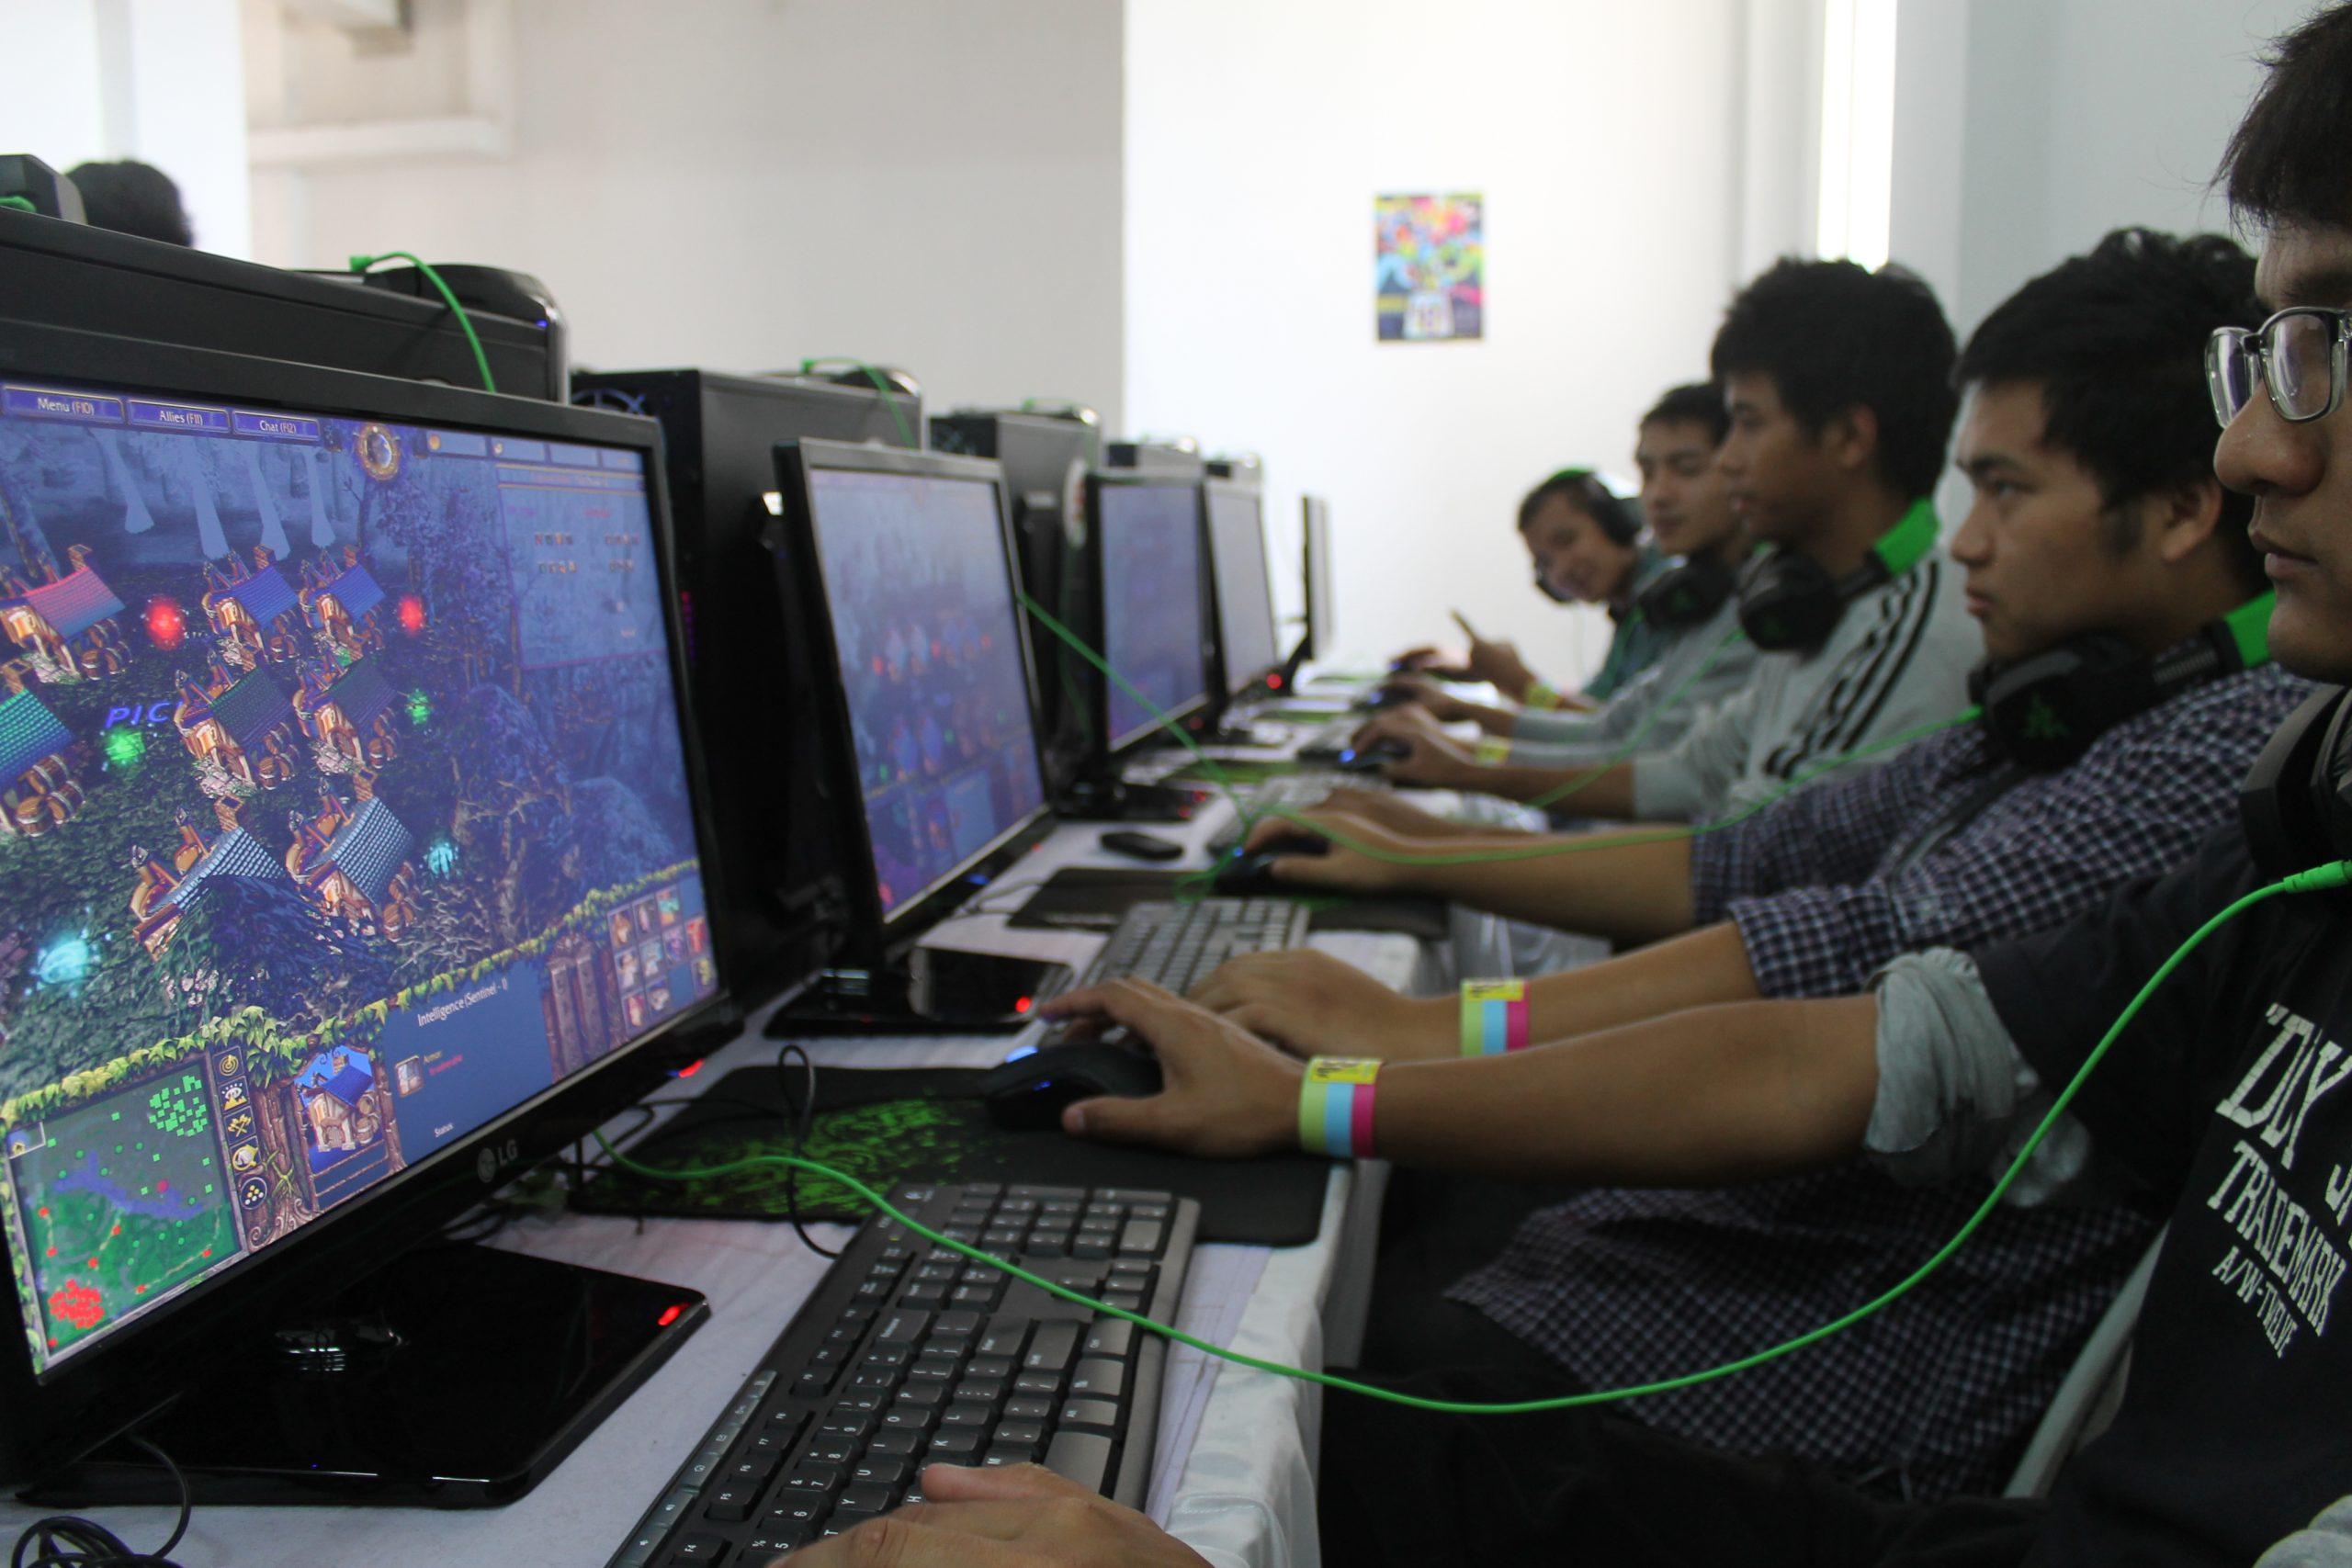 Playing pc games at a playstation